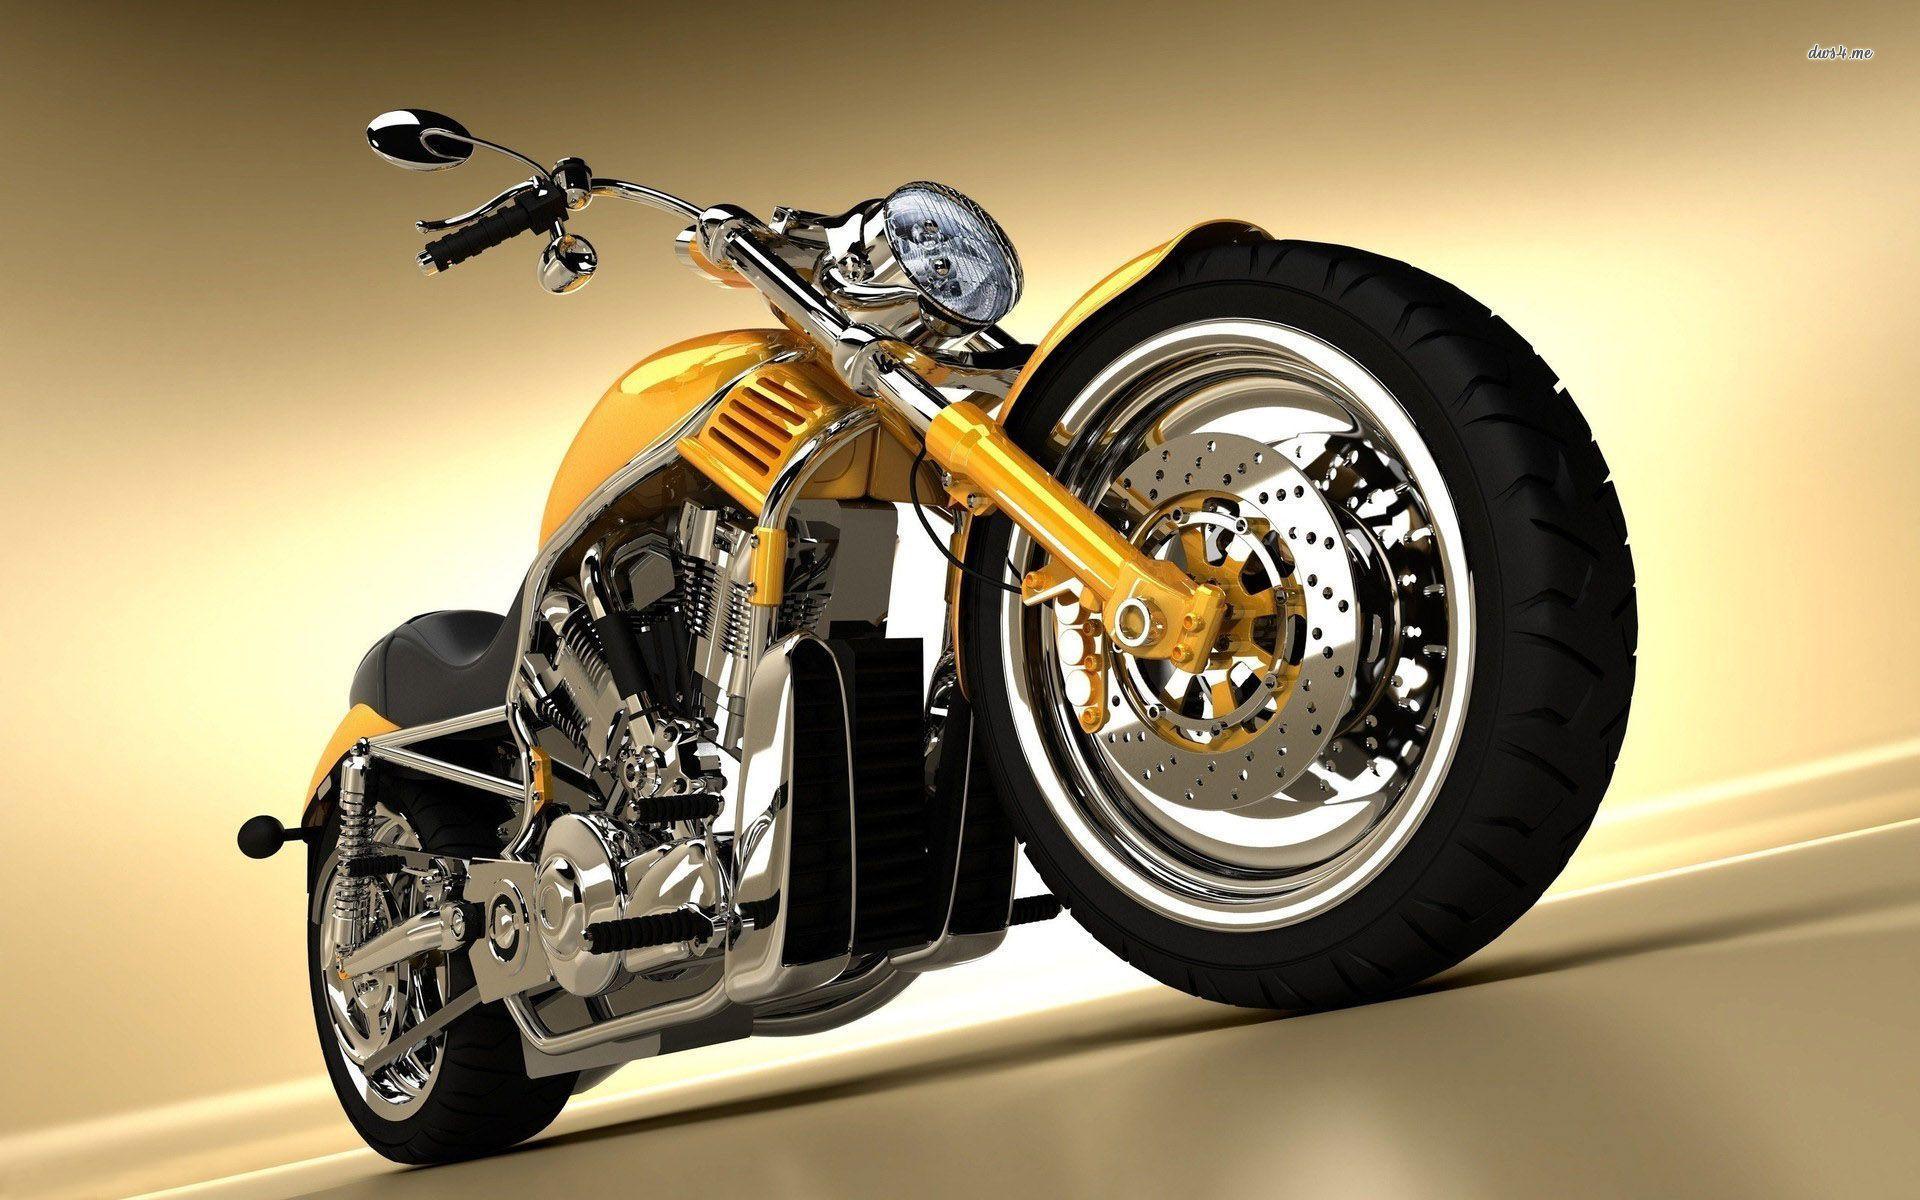 yamaha-bike-hd-wallpapers-beautiful-desktop-background-photographs ...